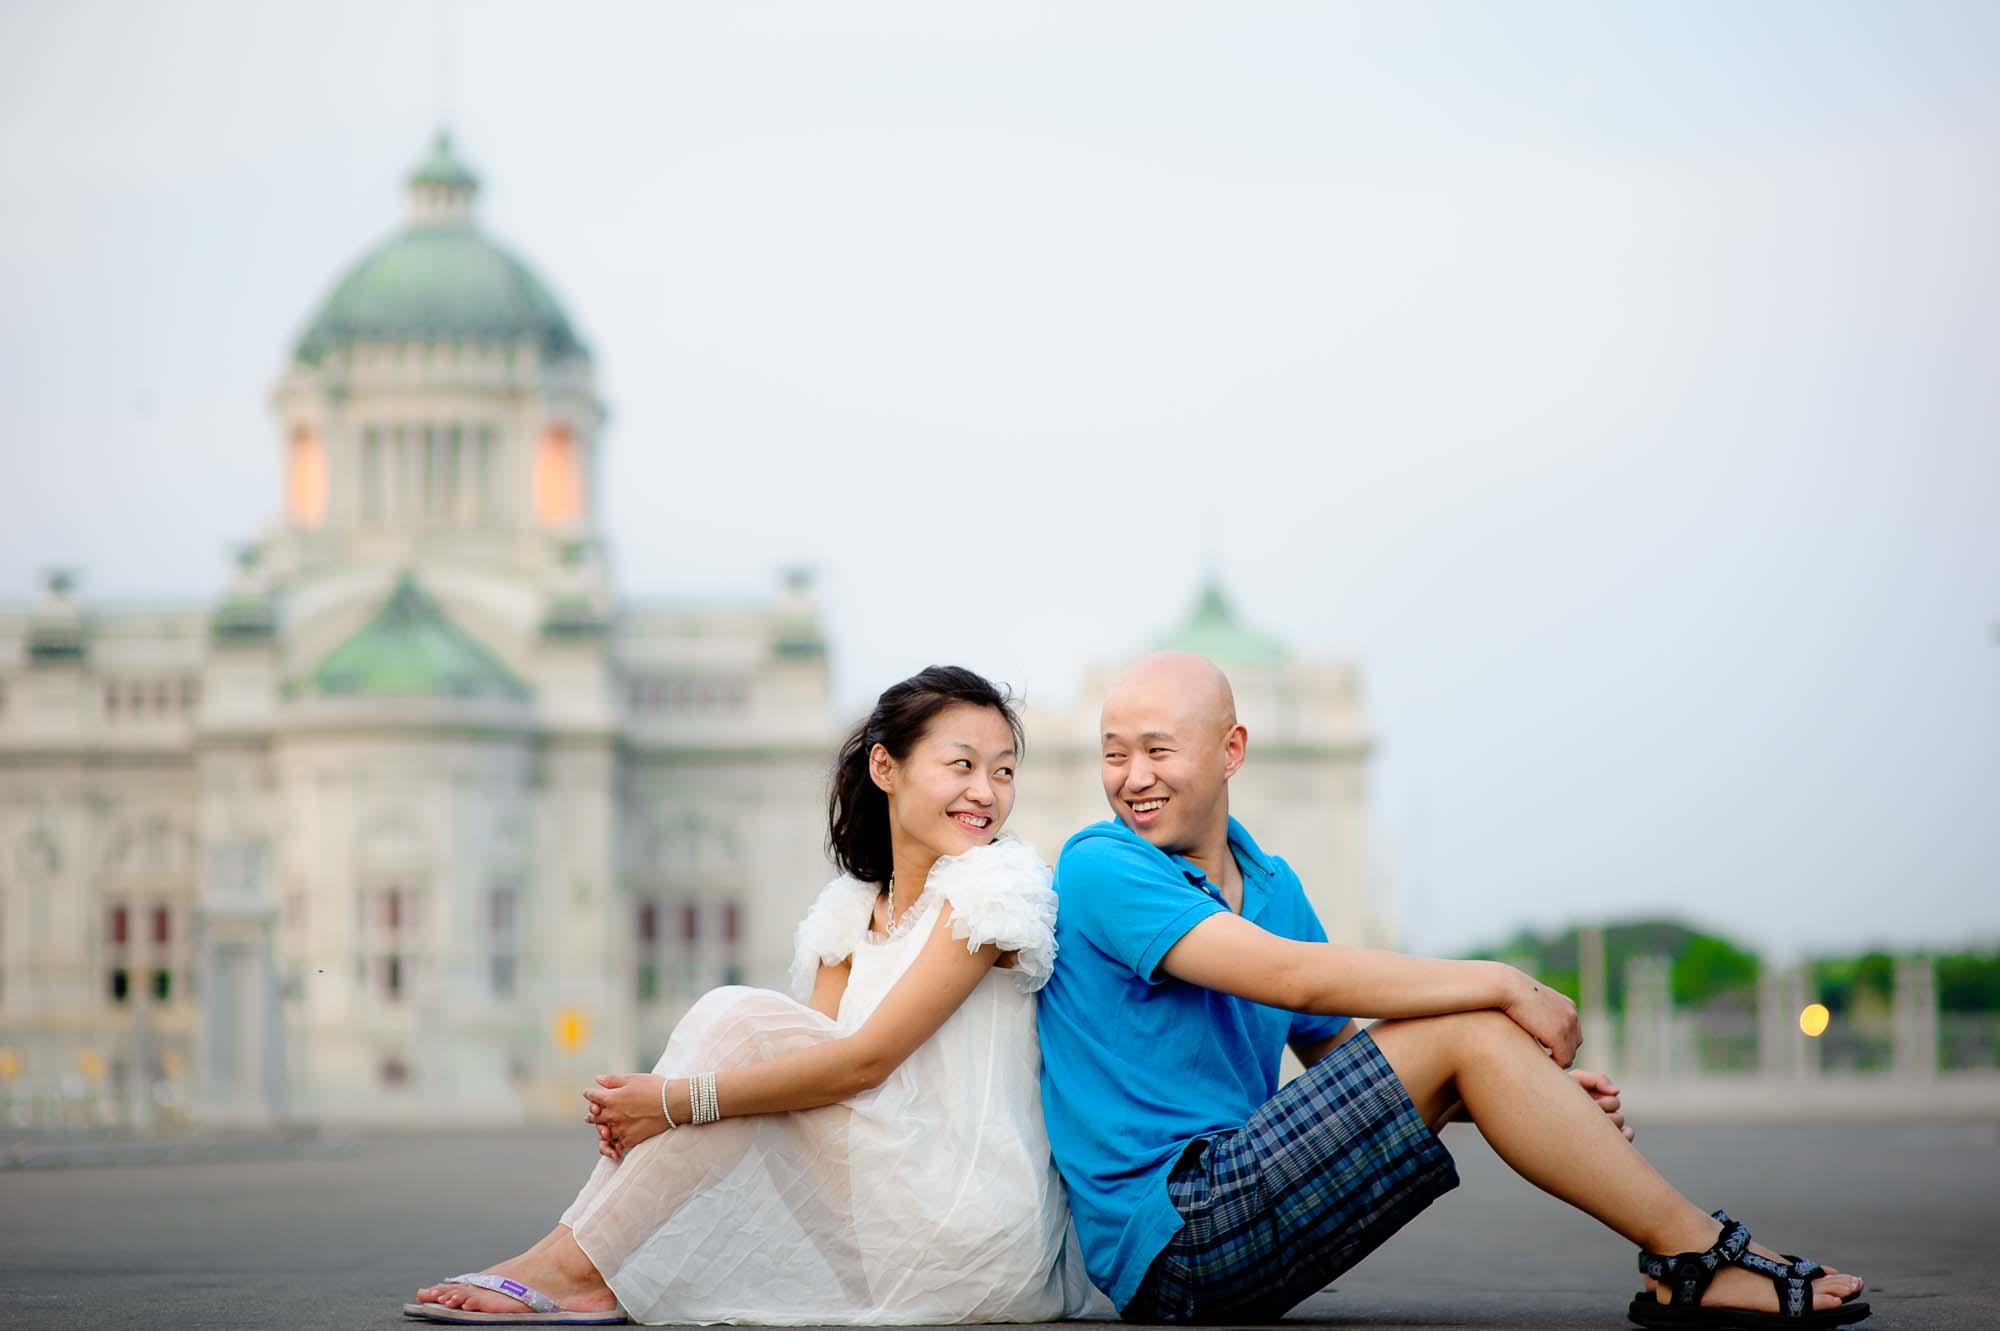 Thailand Bangkok Anantasamakhom Throne Hall Wedding Photography | NET-Photography Thailand Wedding Photographer